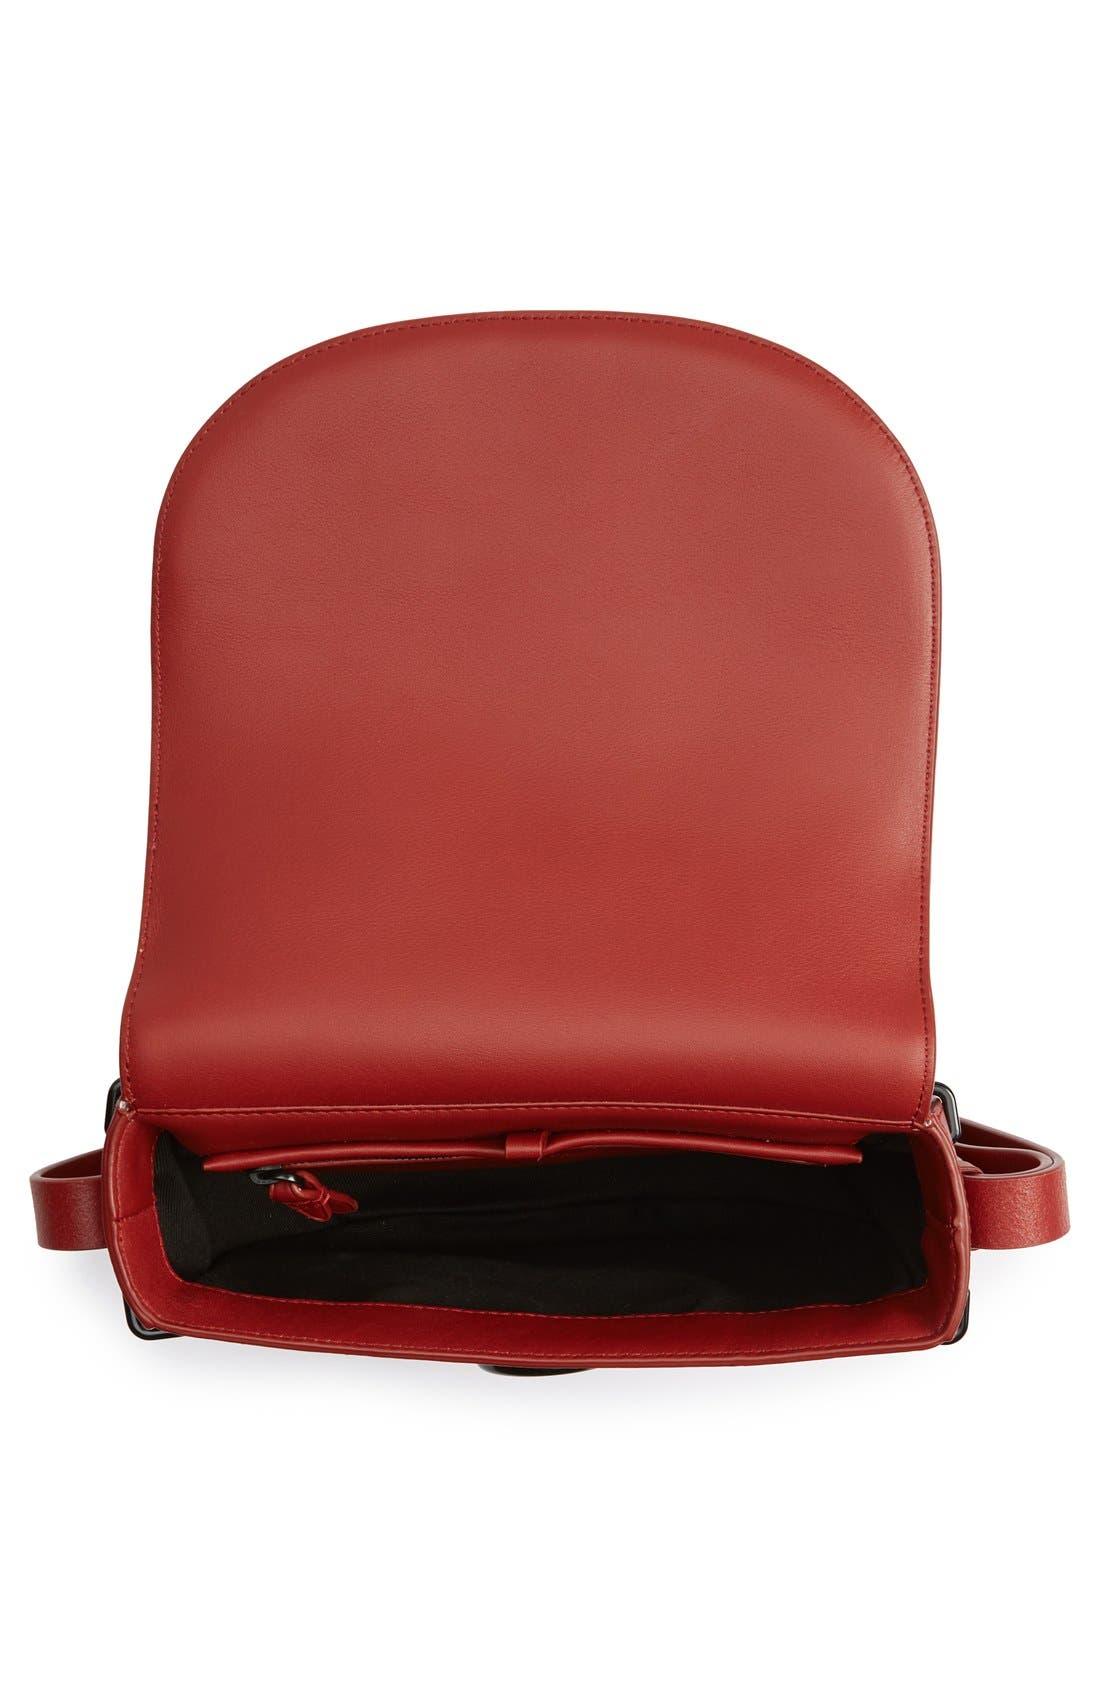 Alix Leather Saddle Bag,                             Alternate thumbnail 12, color,